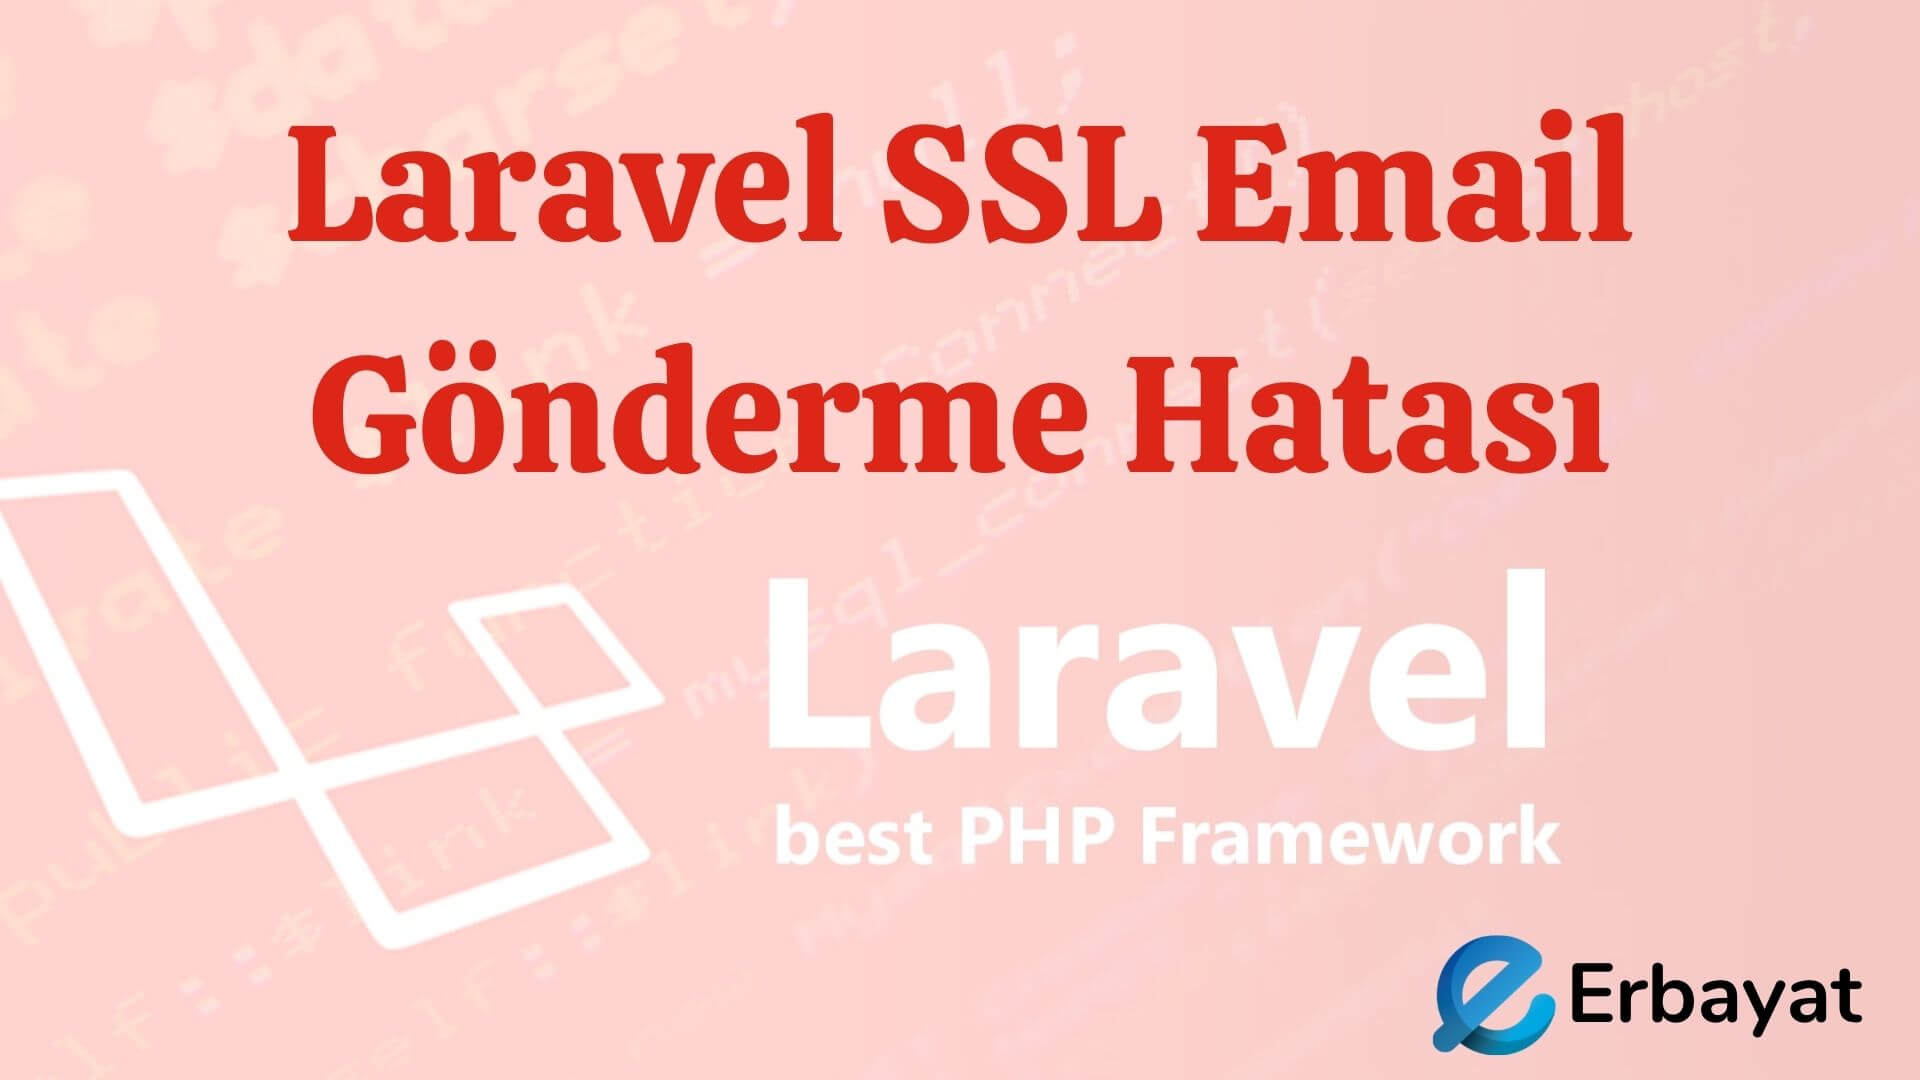 Laravel SSL Email Gönderme Hatası: stream_socket_enable_crypto()